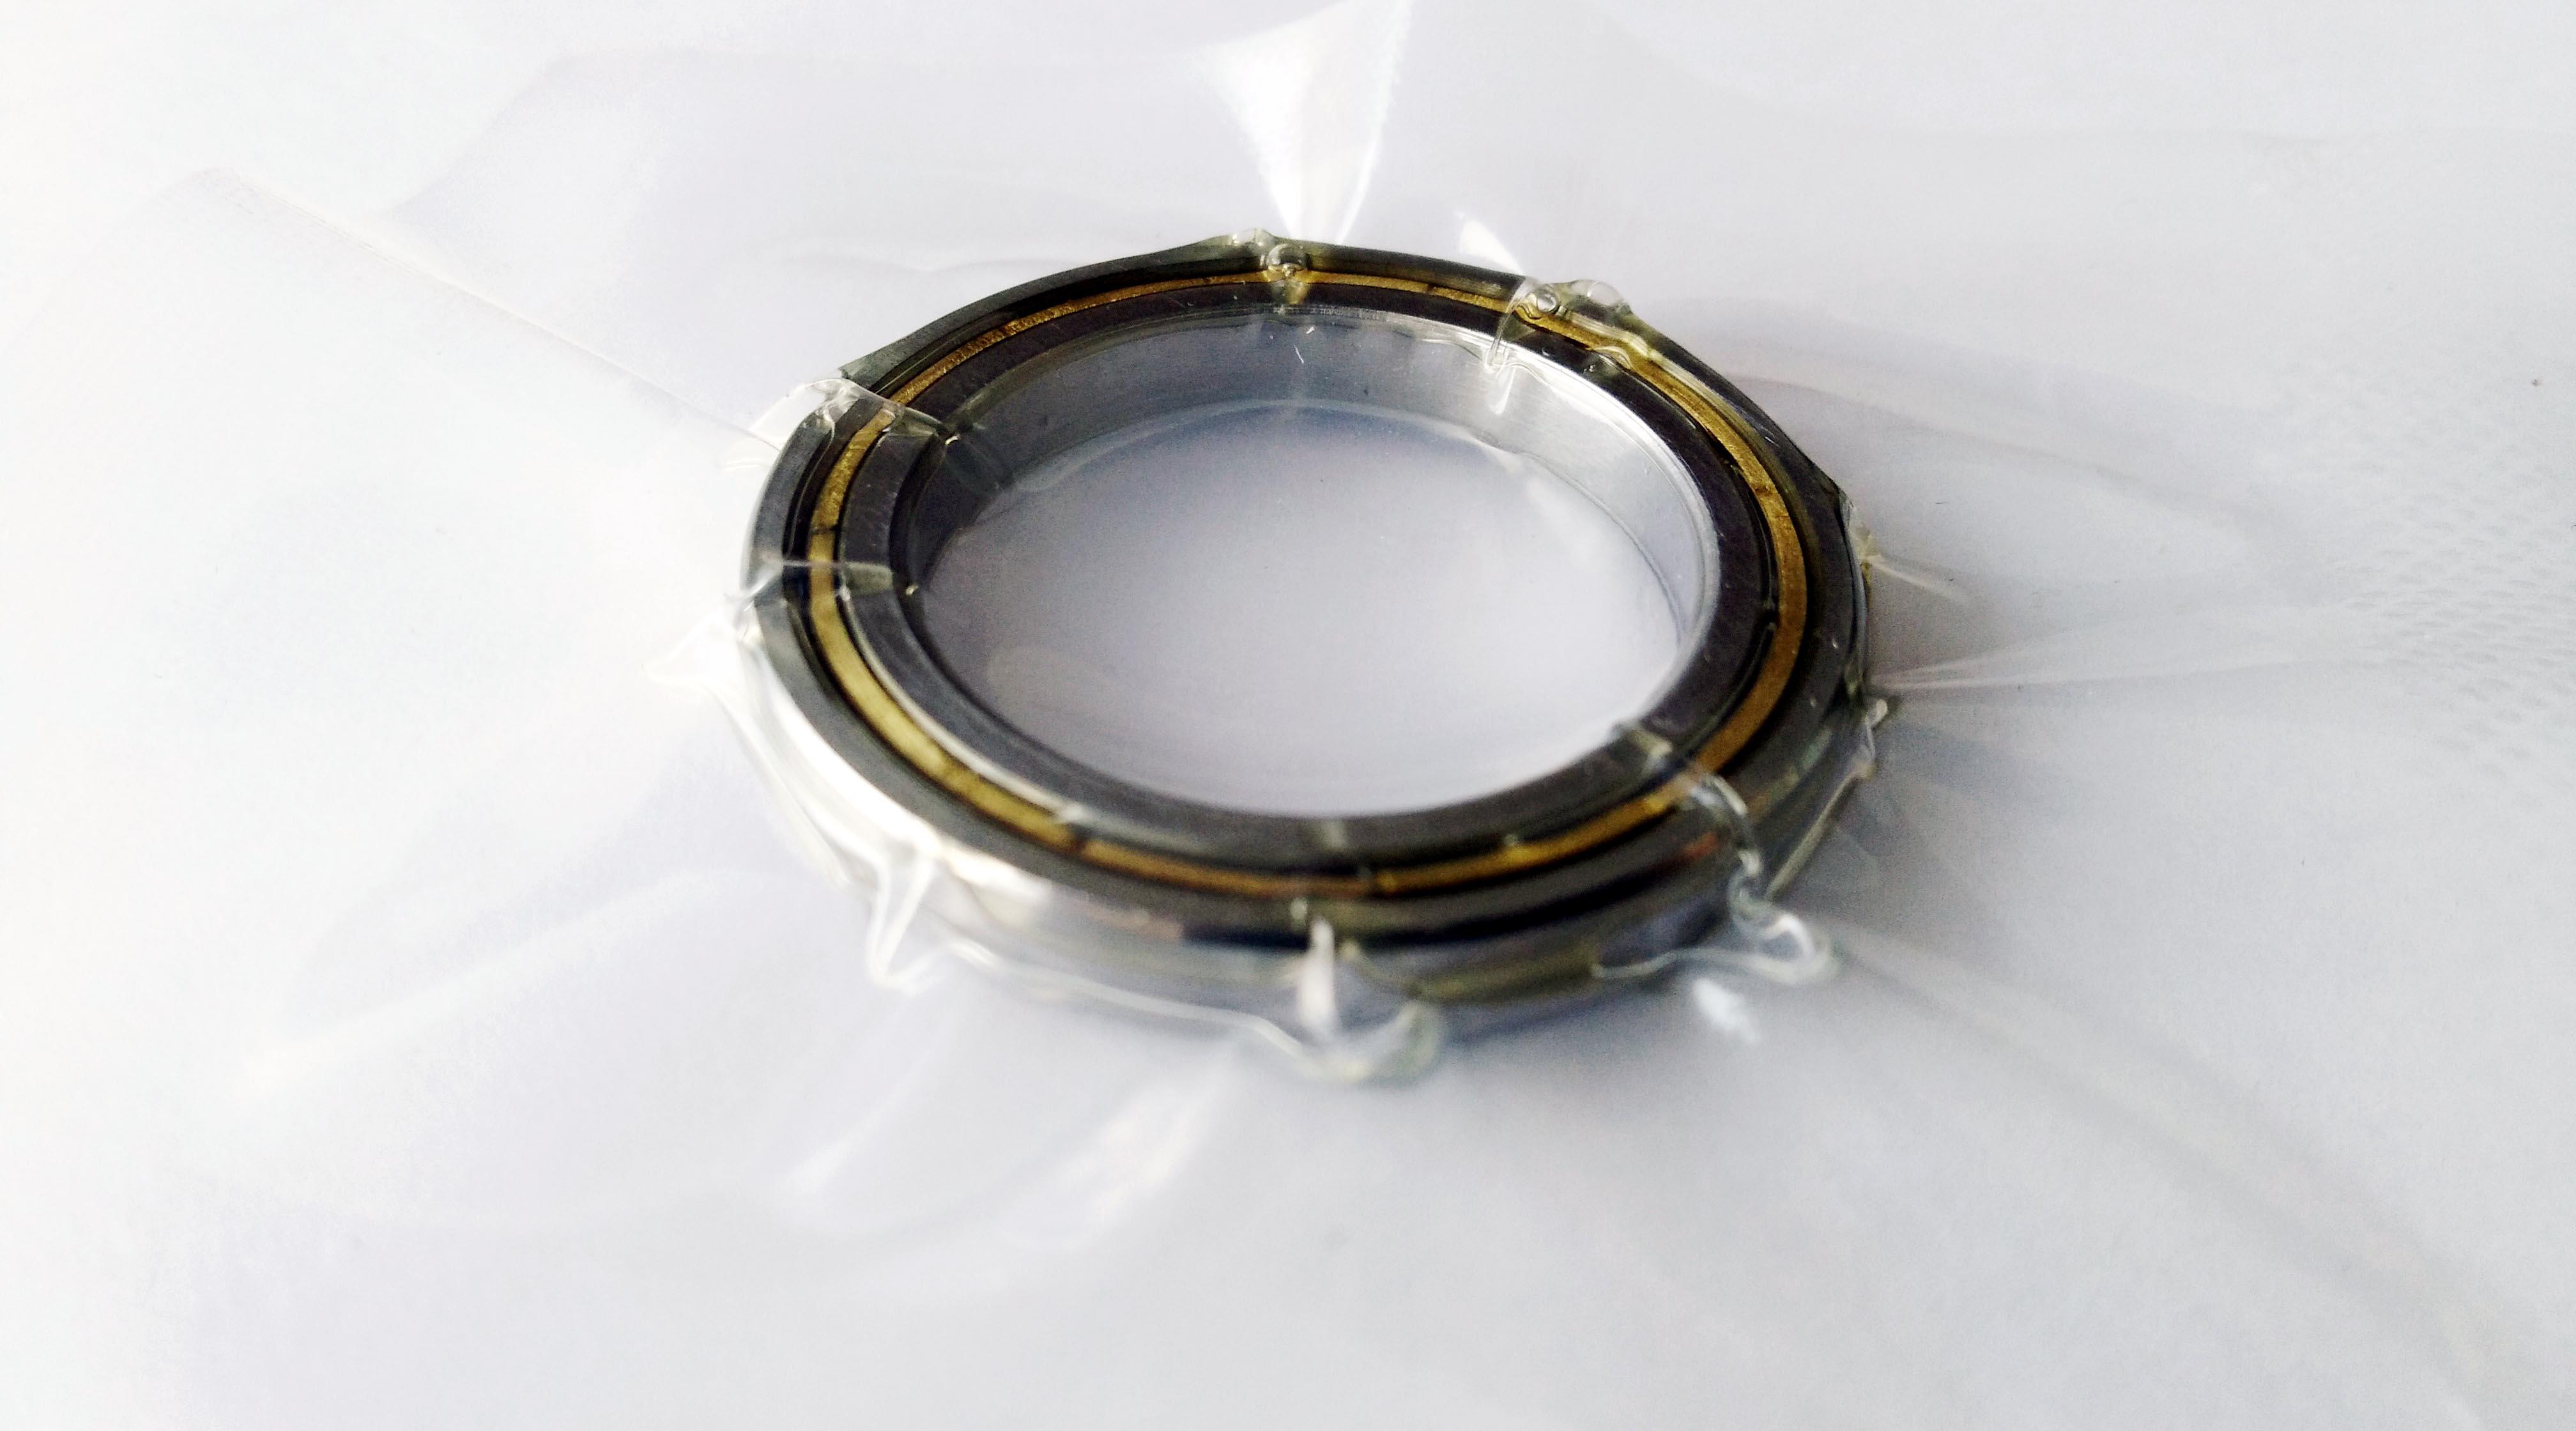 KAA10CL0 25.4*34.925*4.7625mm thin section deep groove ball bearing manufacturers